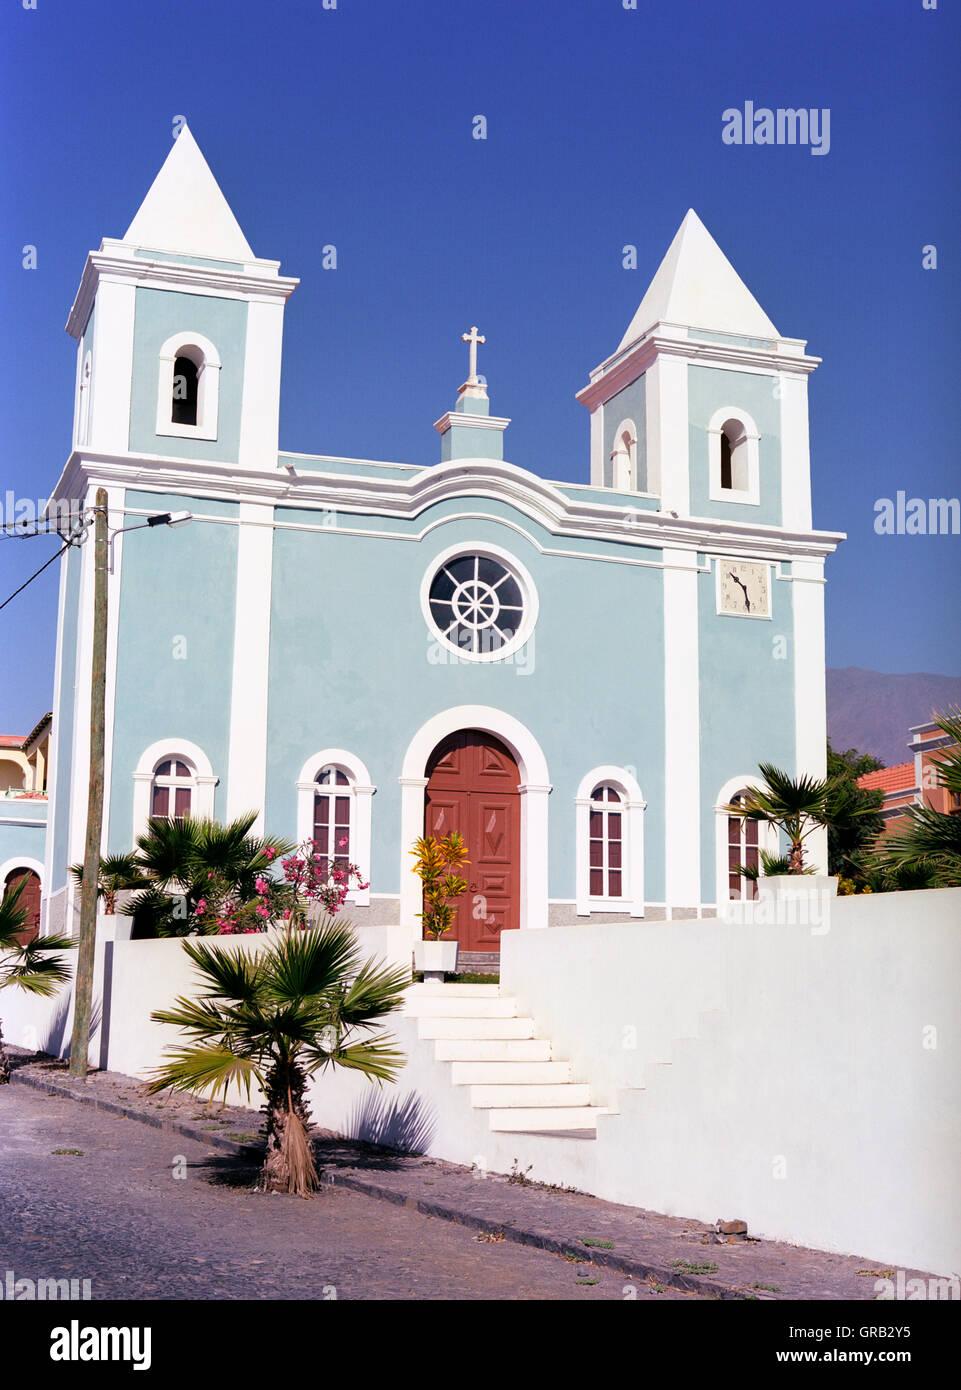 Ortsgemeinde, San Felipe, Fogo, Kapverdische Inseln, Afrika Stockbild